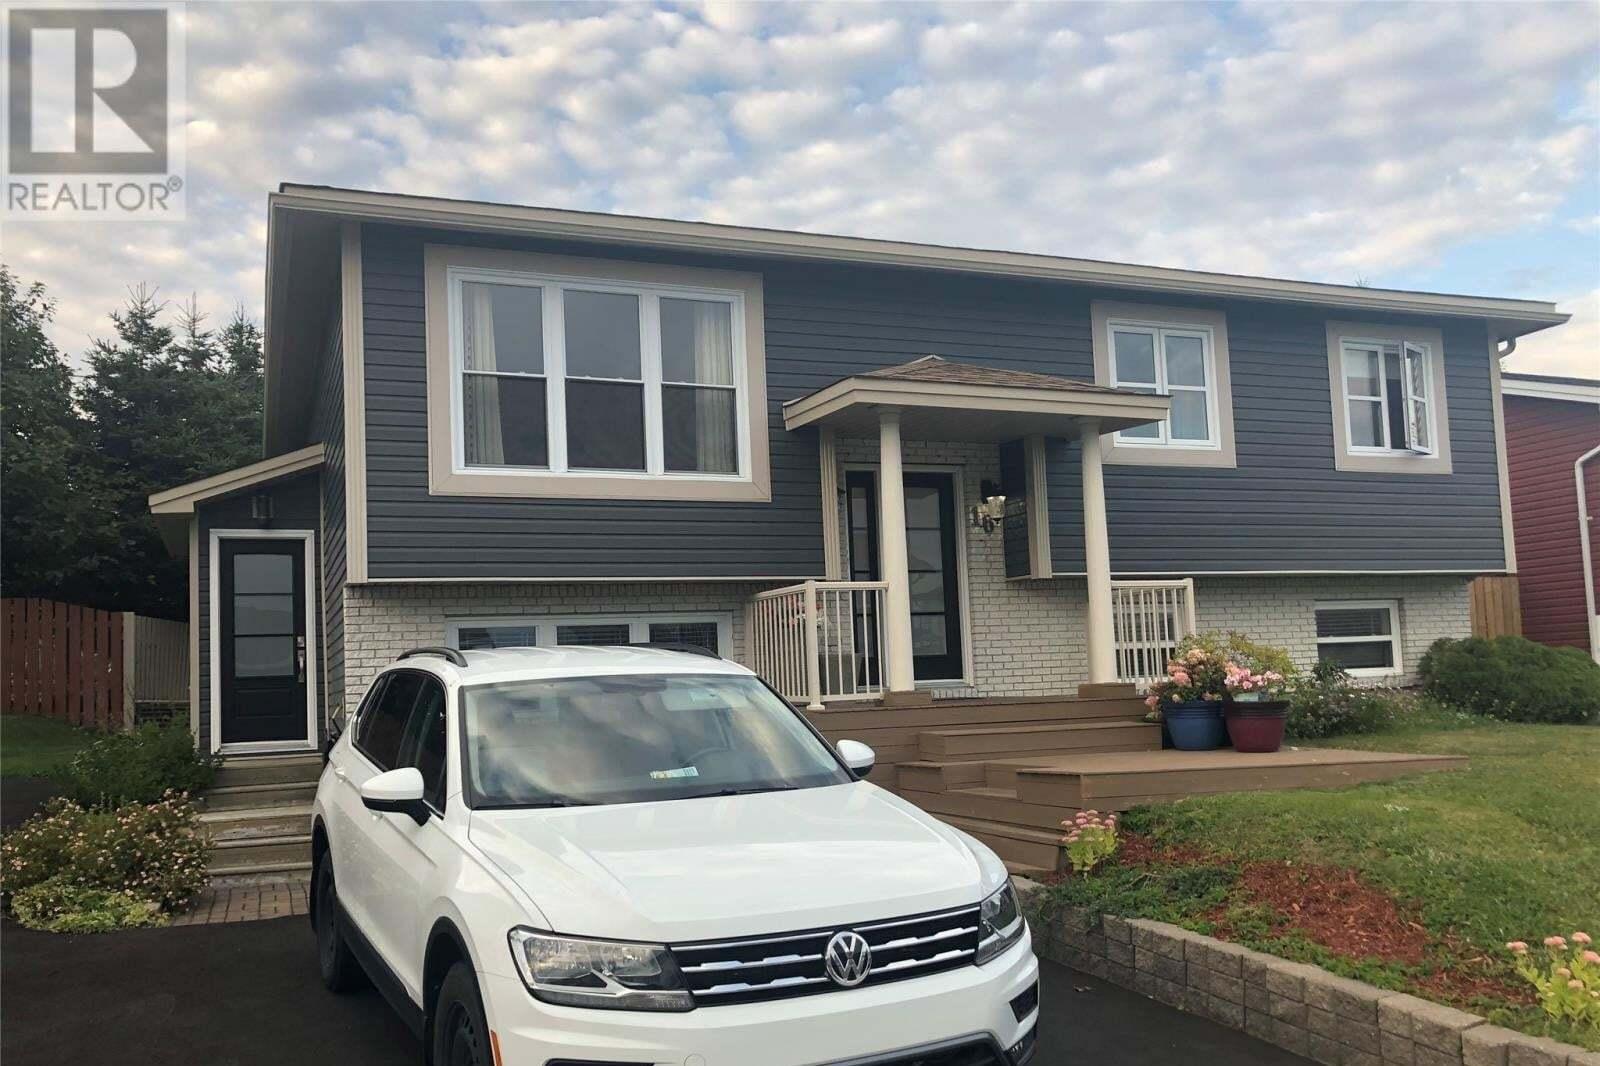 House for sale at 16 Point Verde Pl St. John's Newfoundland - MLS: 1221235